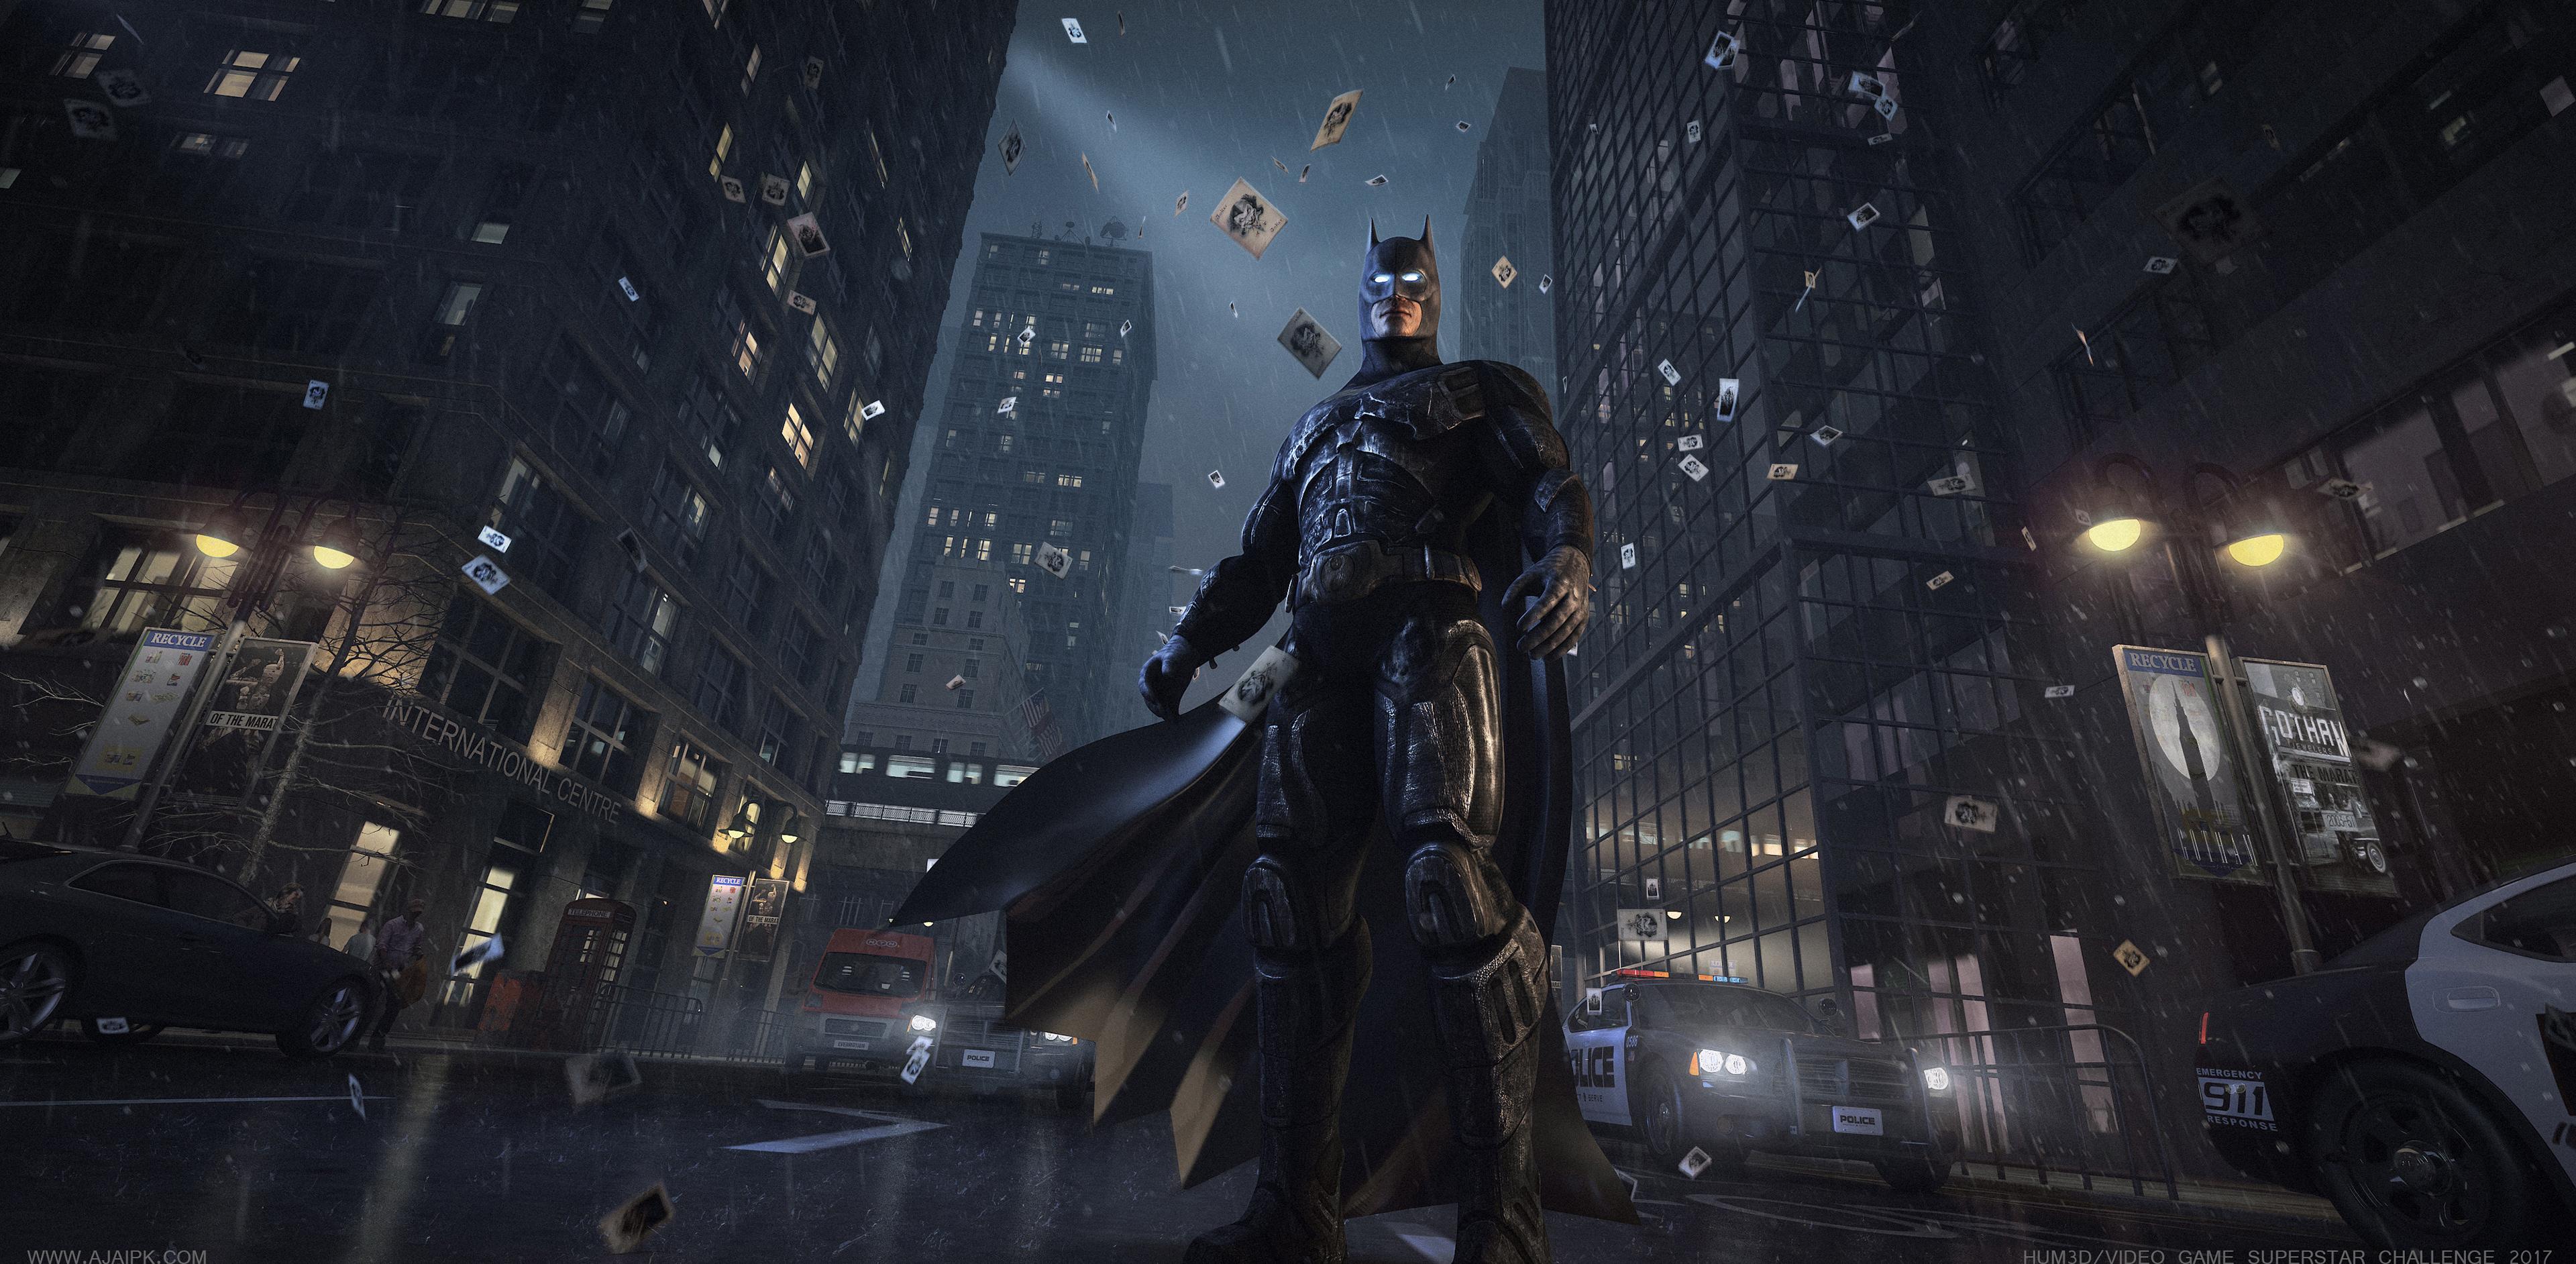 2560x1700 Batman Watching Gotham City Chromebook Pixel Hd 4k